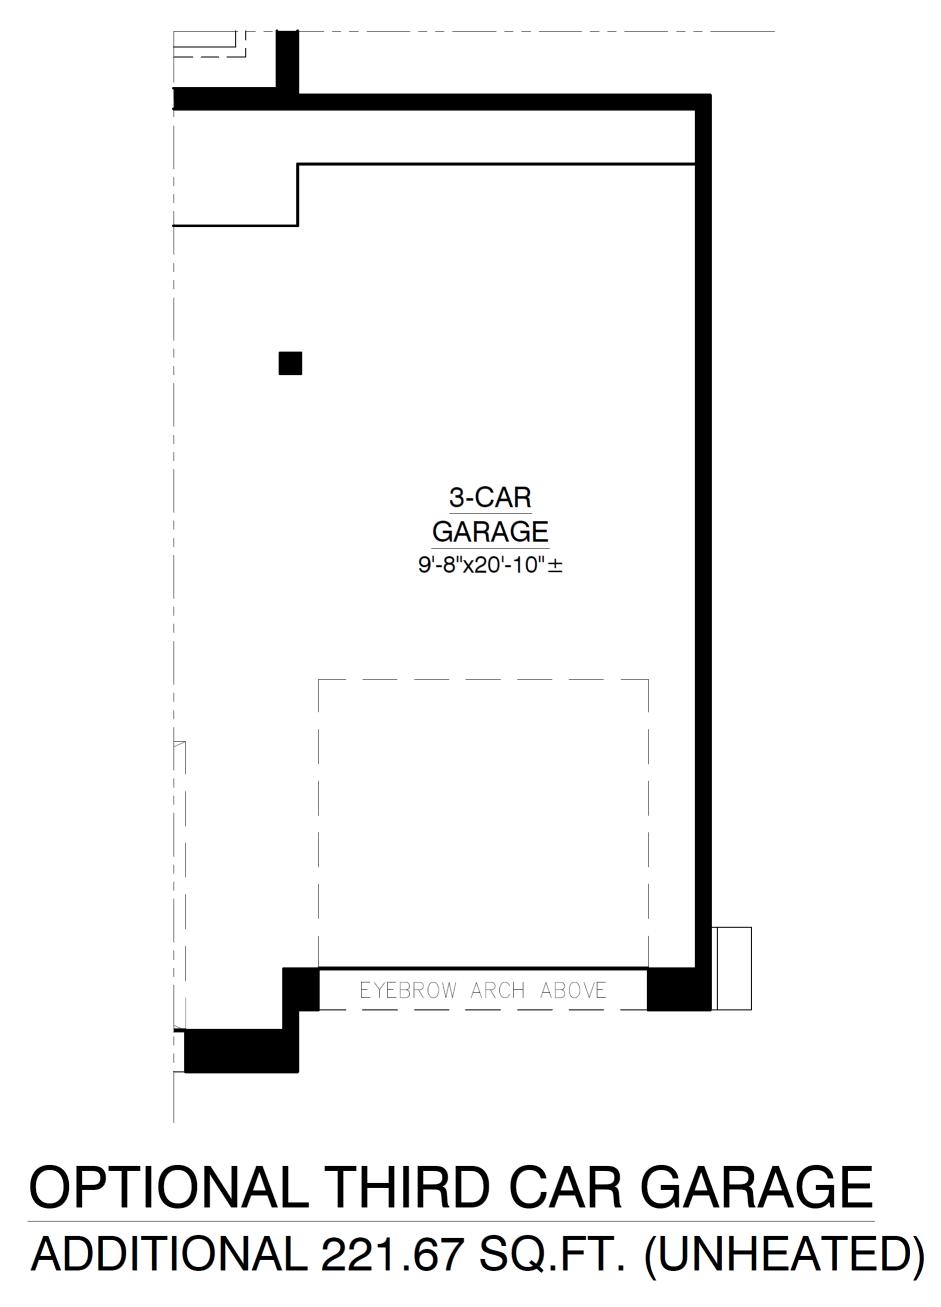 Optional 3rd Car Garage